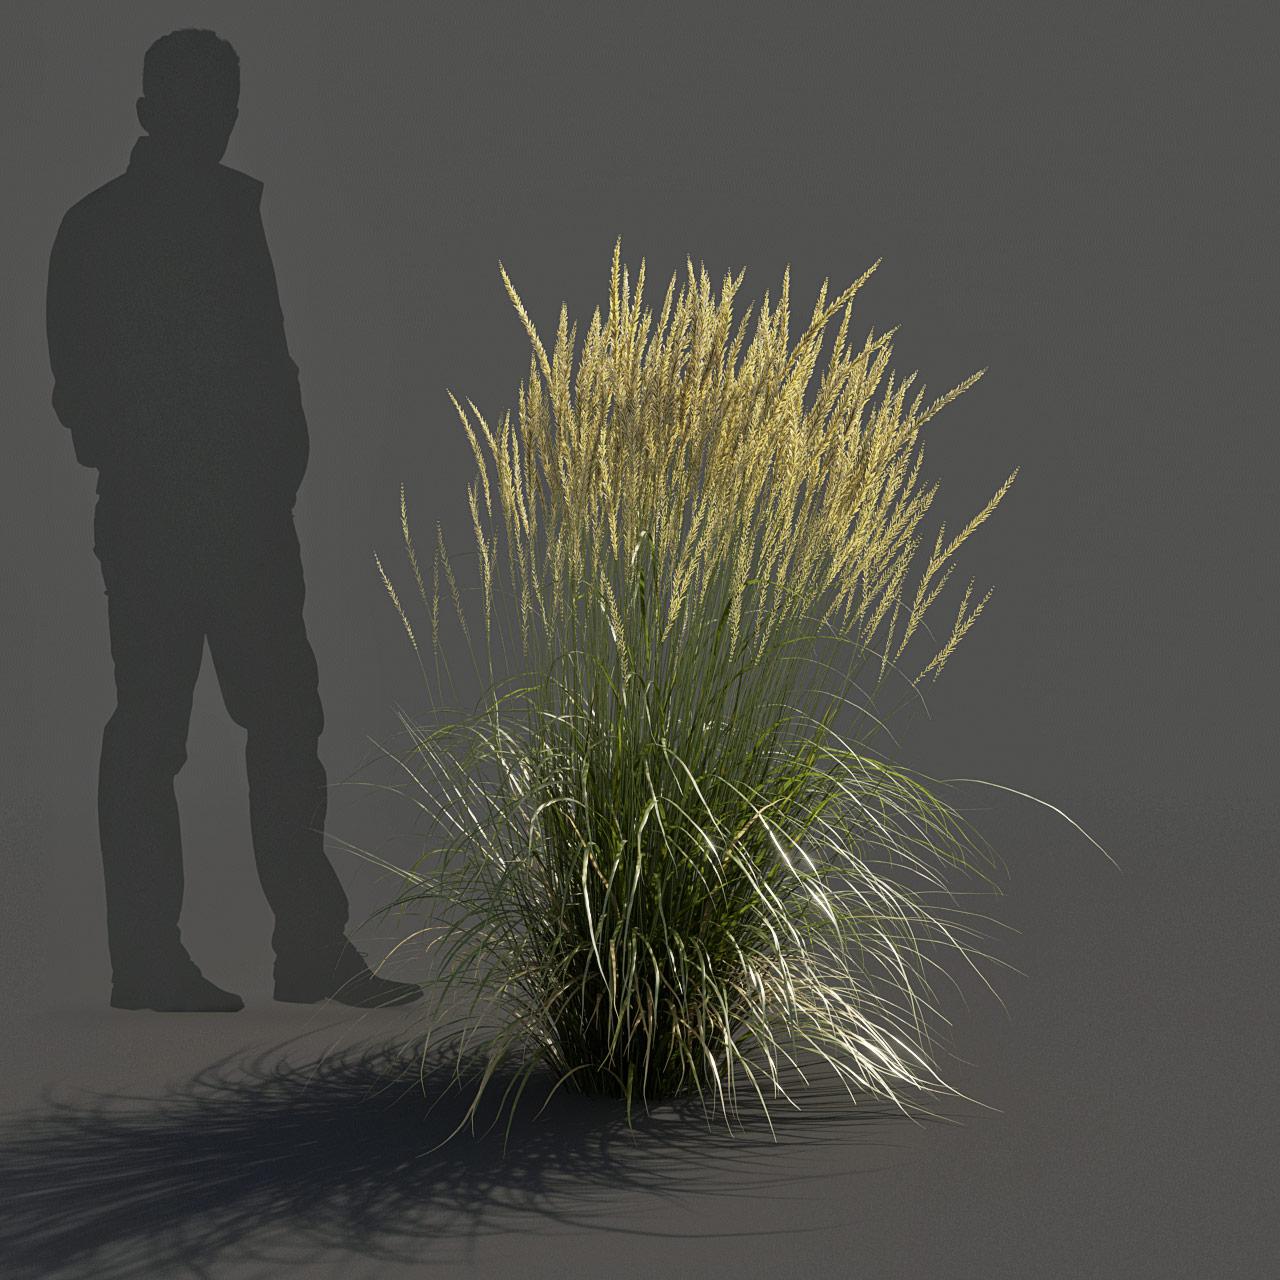 Feather Reed Grass 3D model medium_v02 -  'Karl Foerster' - Calamagrostis acutiflora